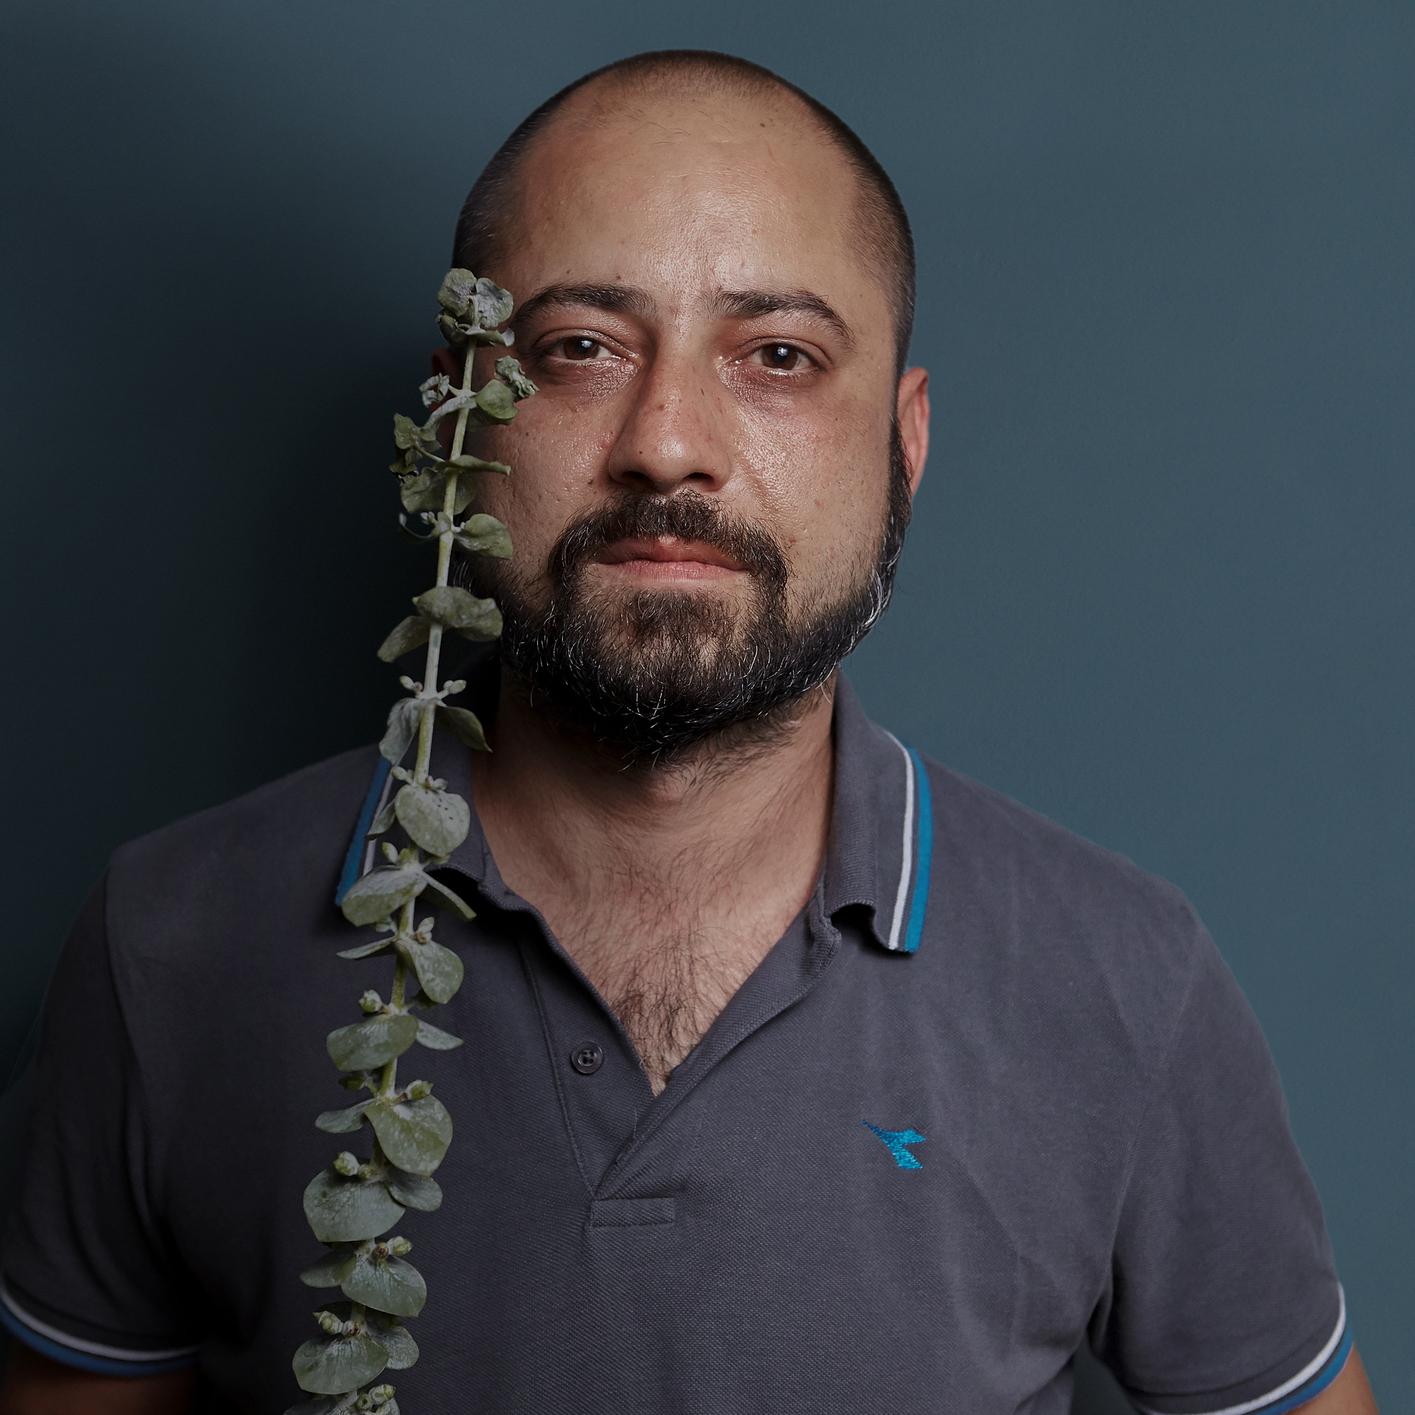 Filippo Calveri